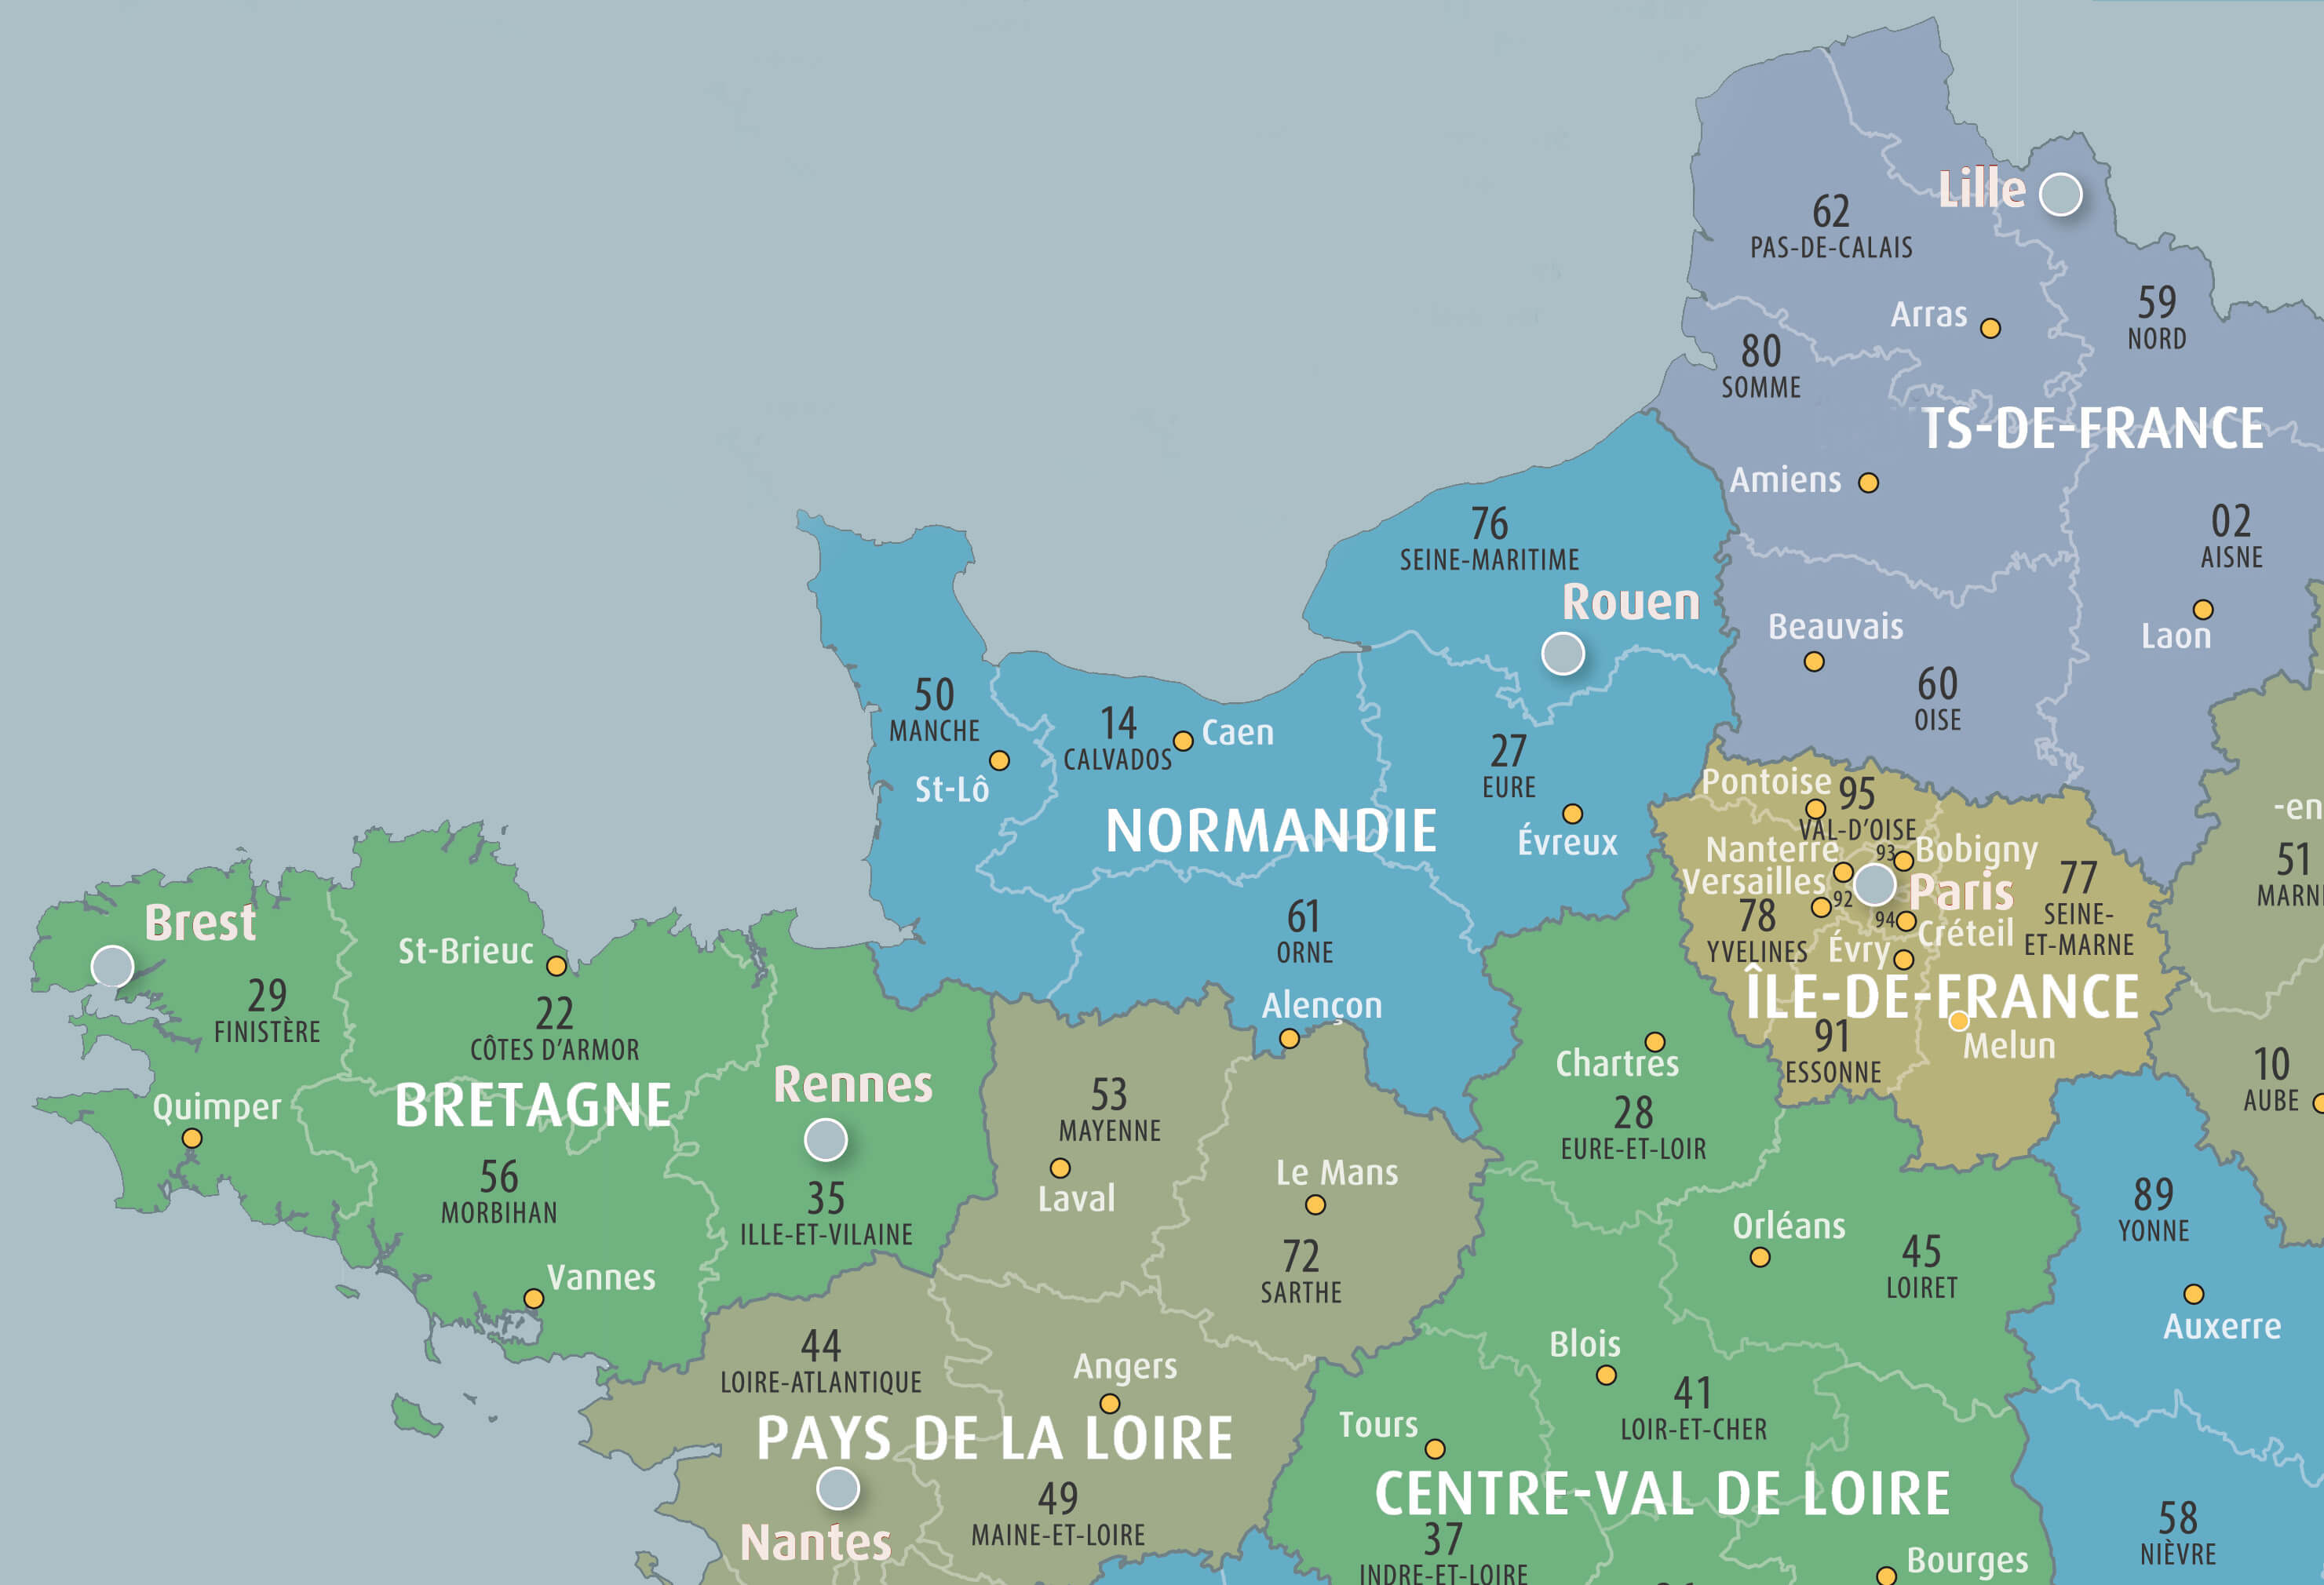 region france - Homepage - Location de Gite La Clef Decamp - Laclefdecamp.fr